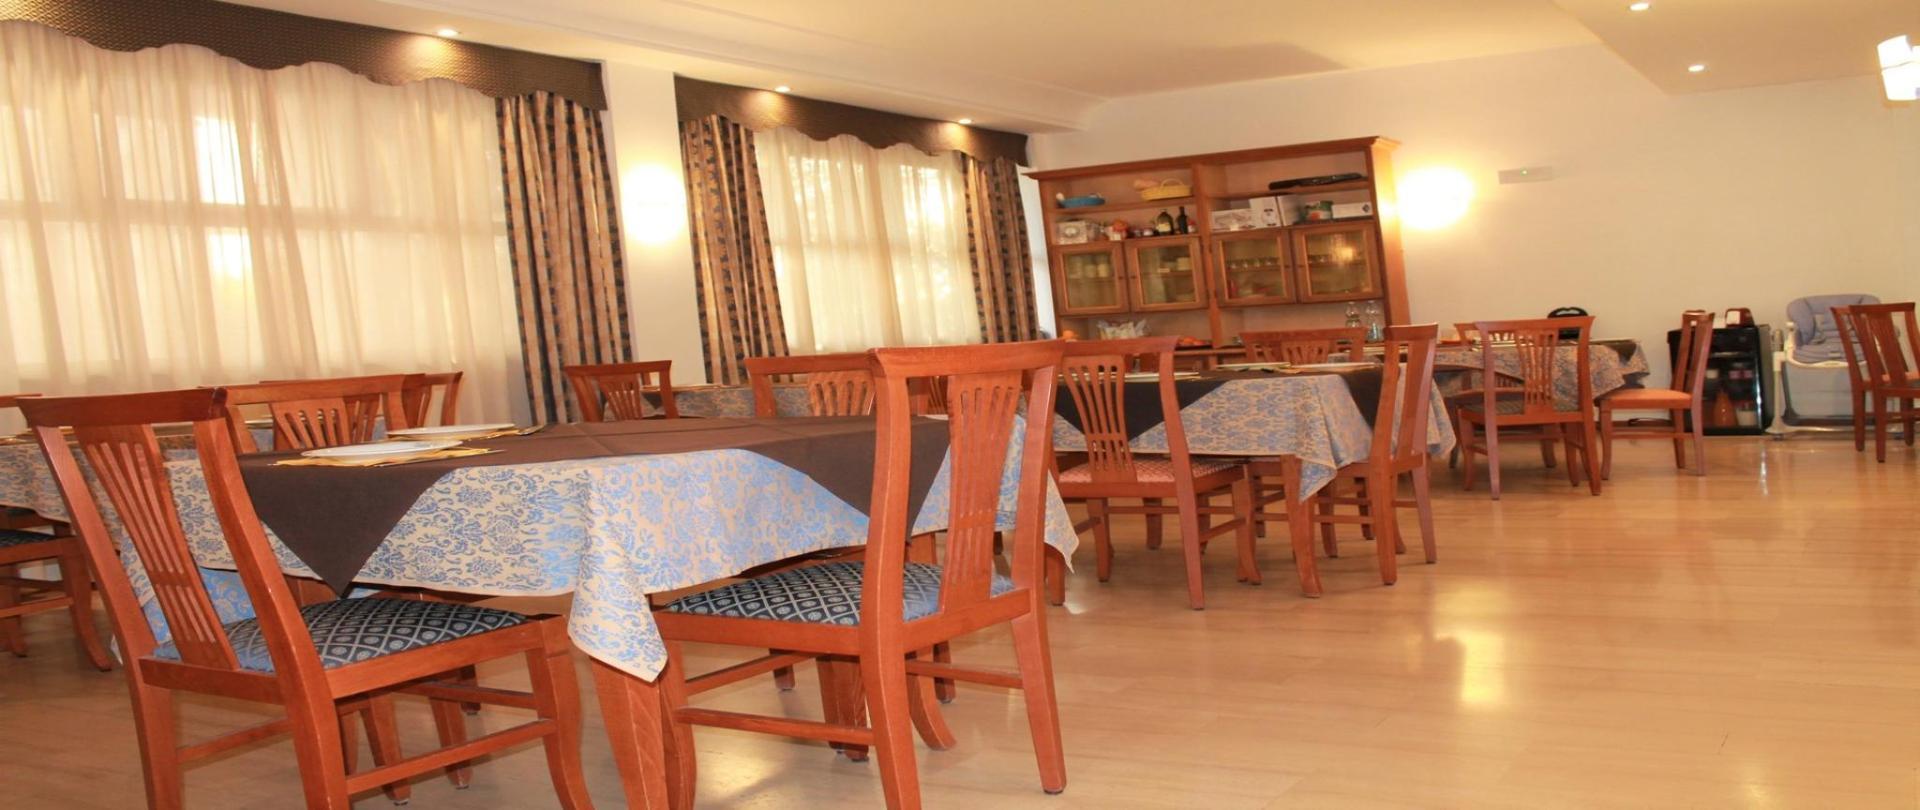 sala colazione 1.jpg